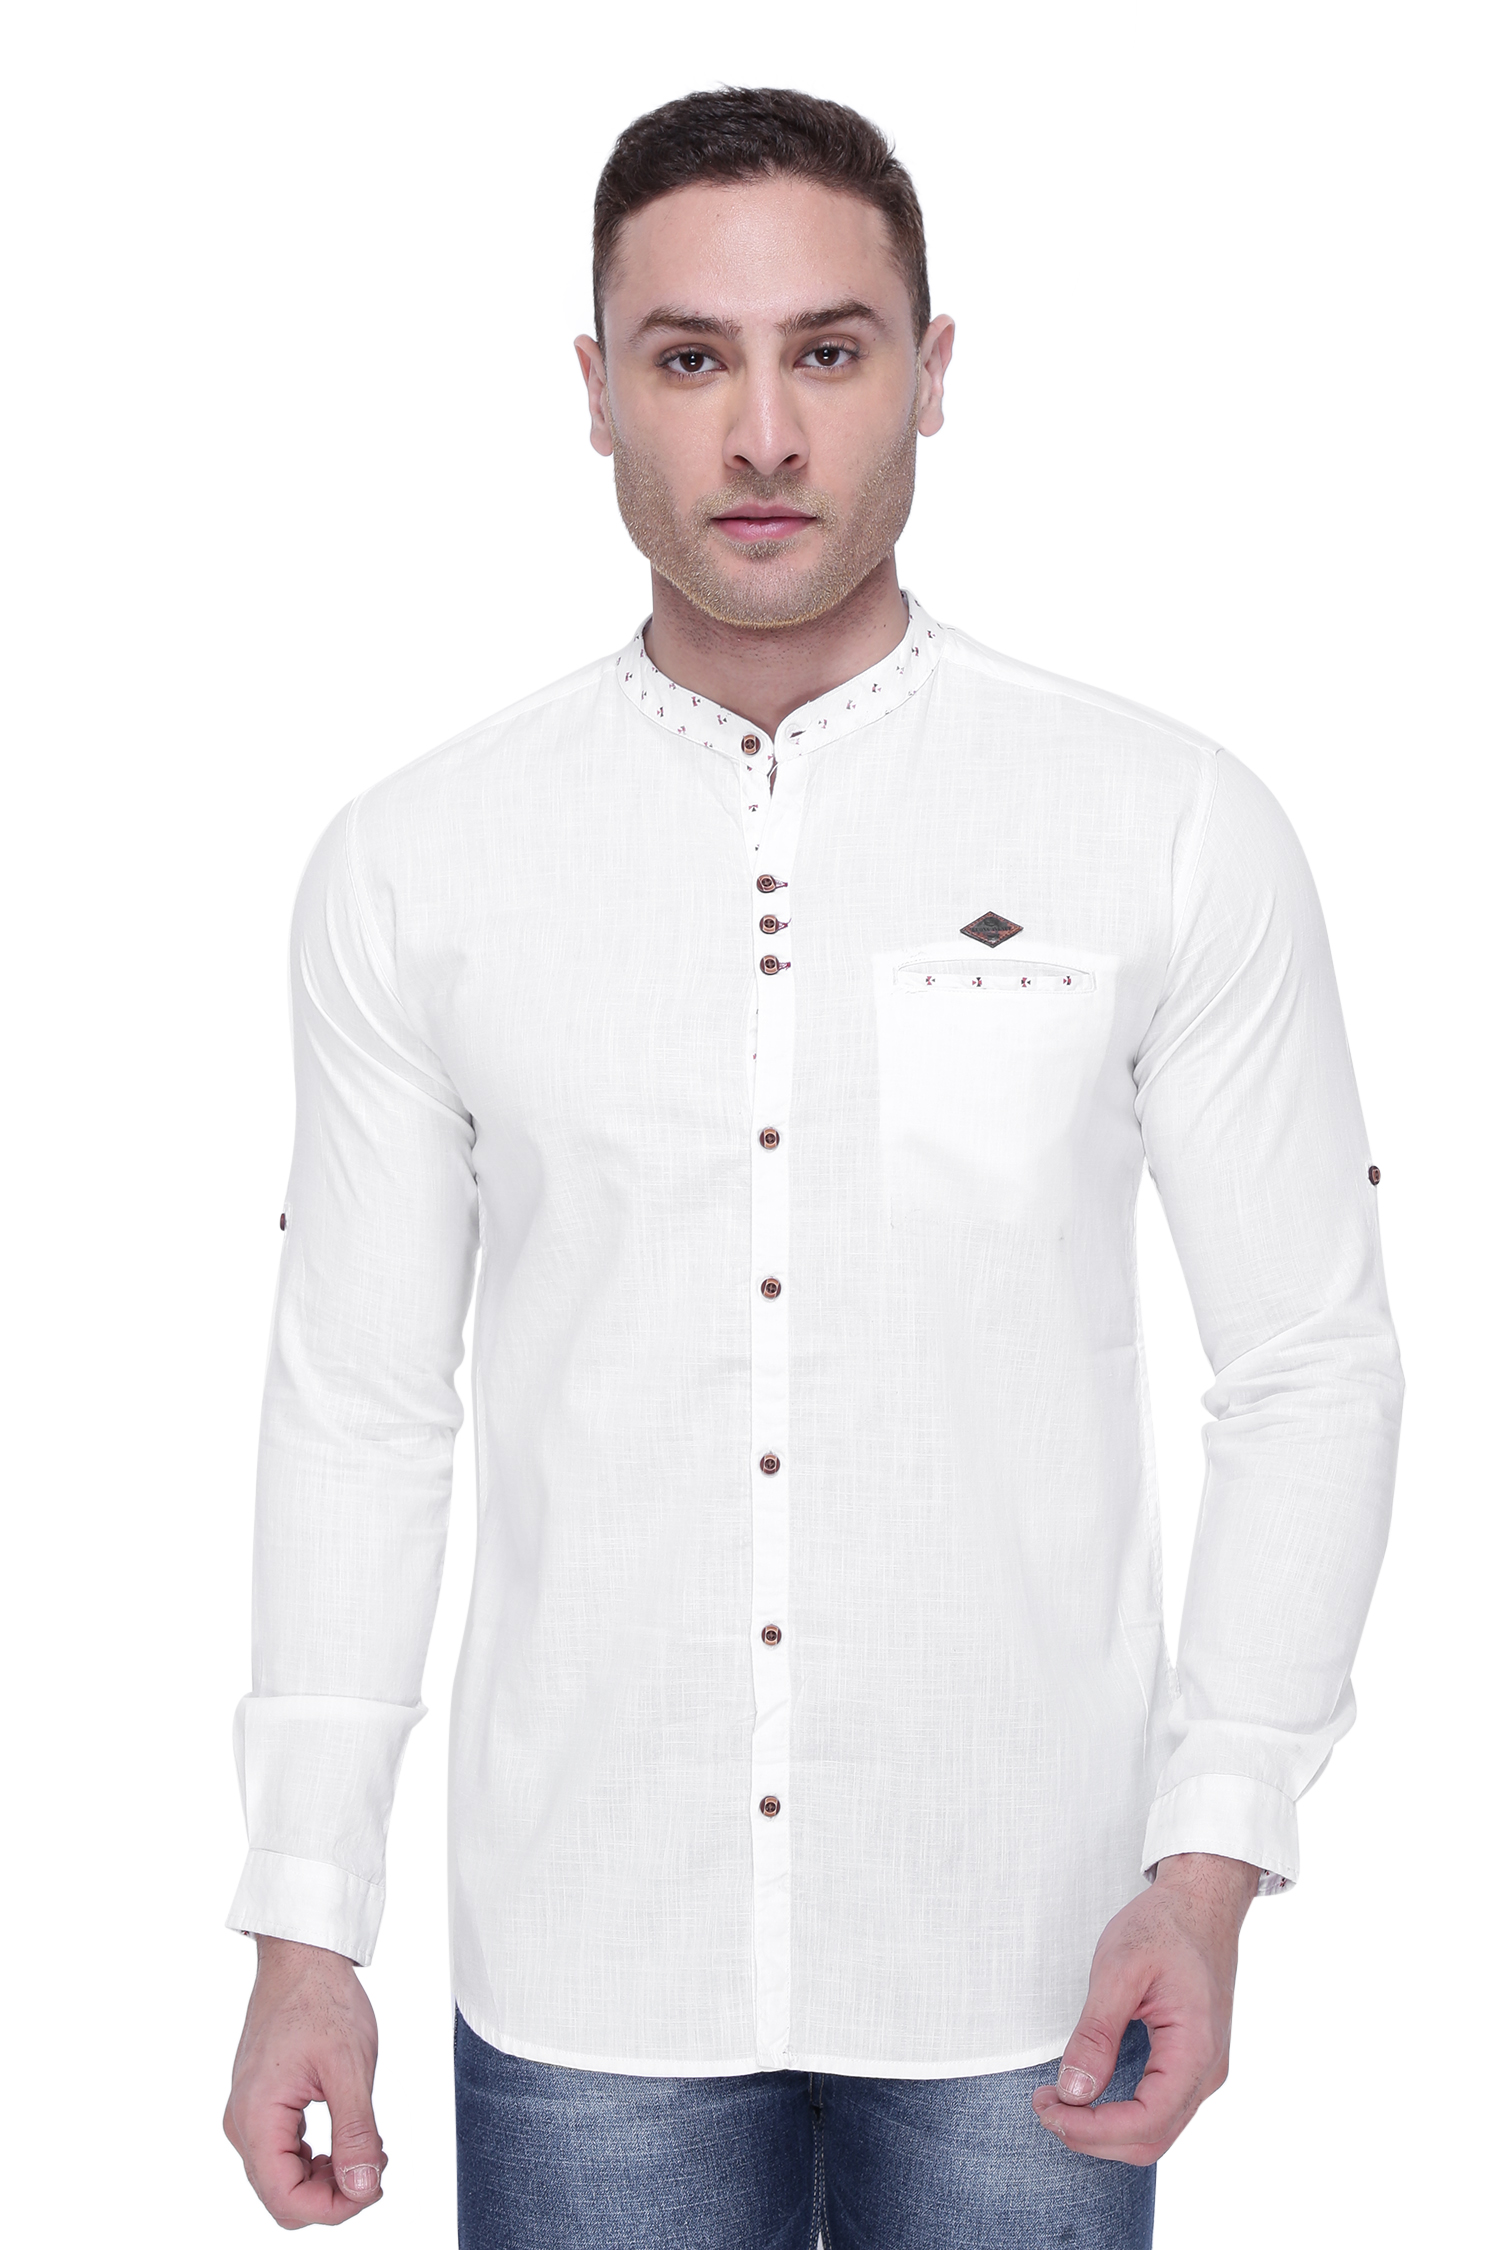 Kuons Avenue | Kuons Avenue Men's White  Linen Cotton Shirt- KACLFS1167WHT